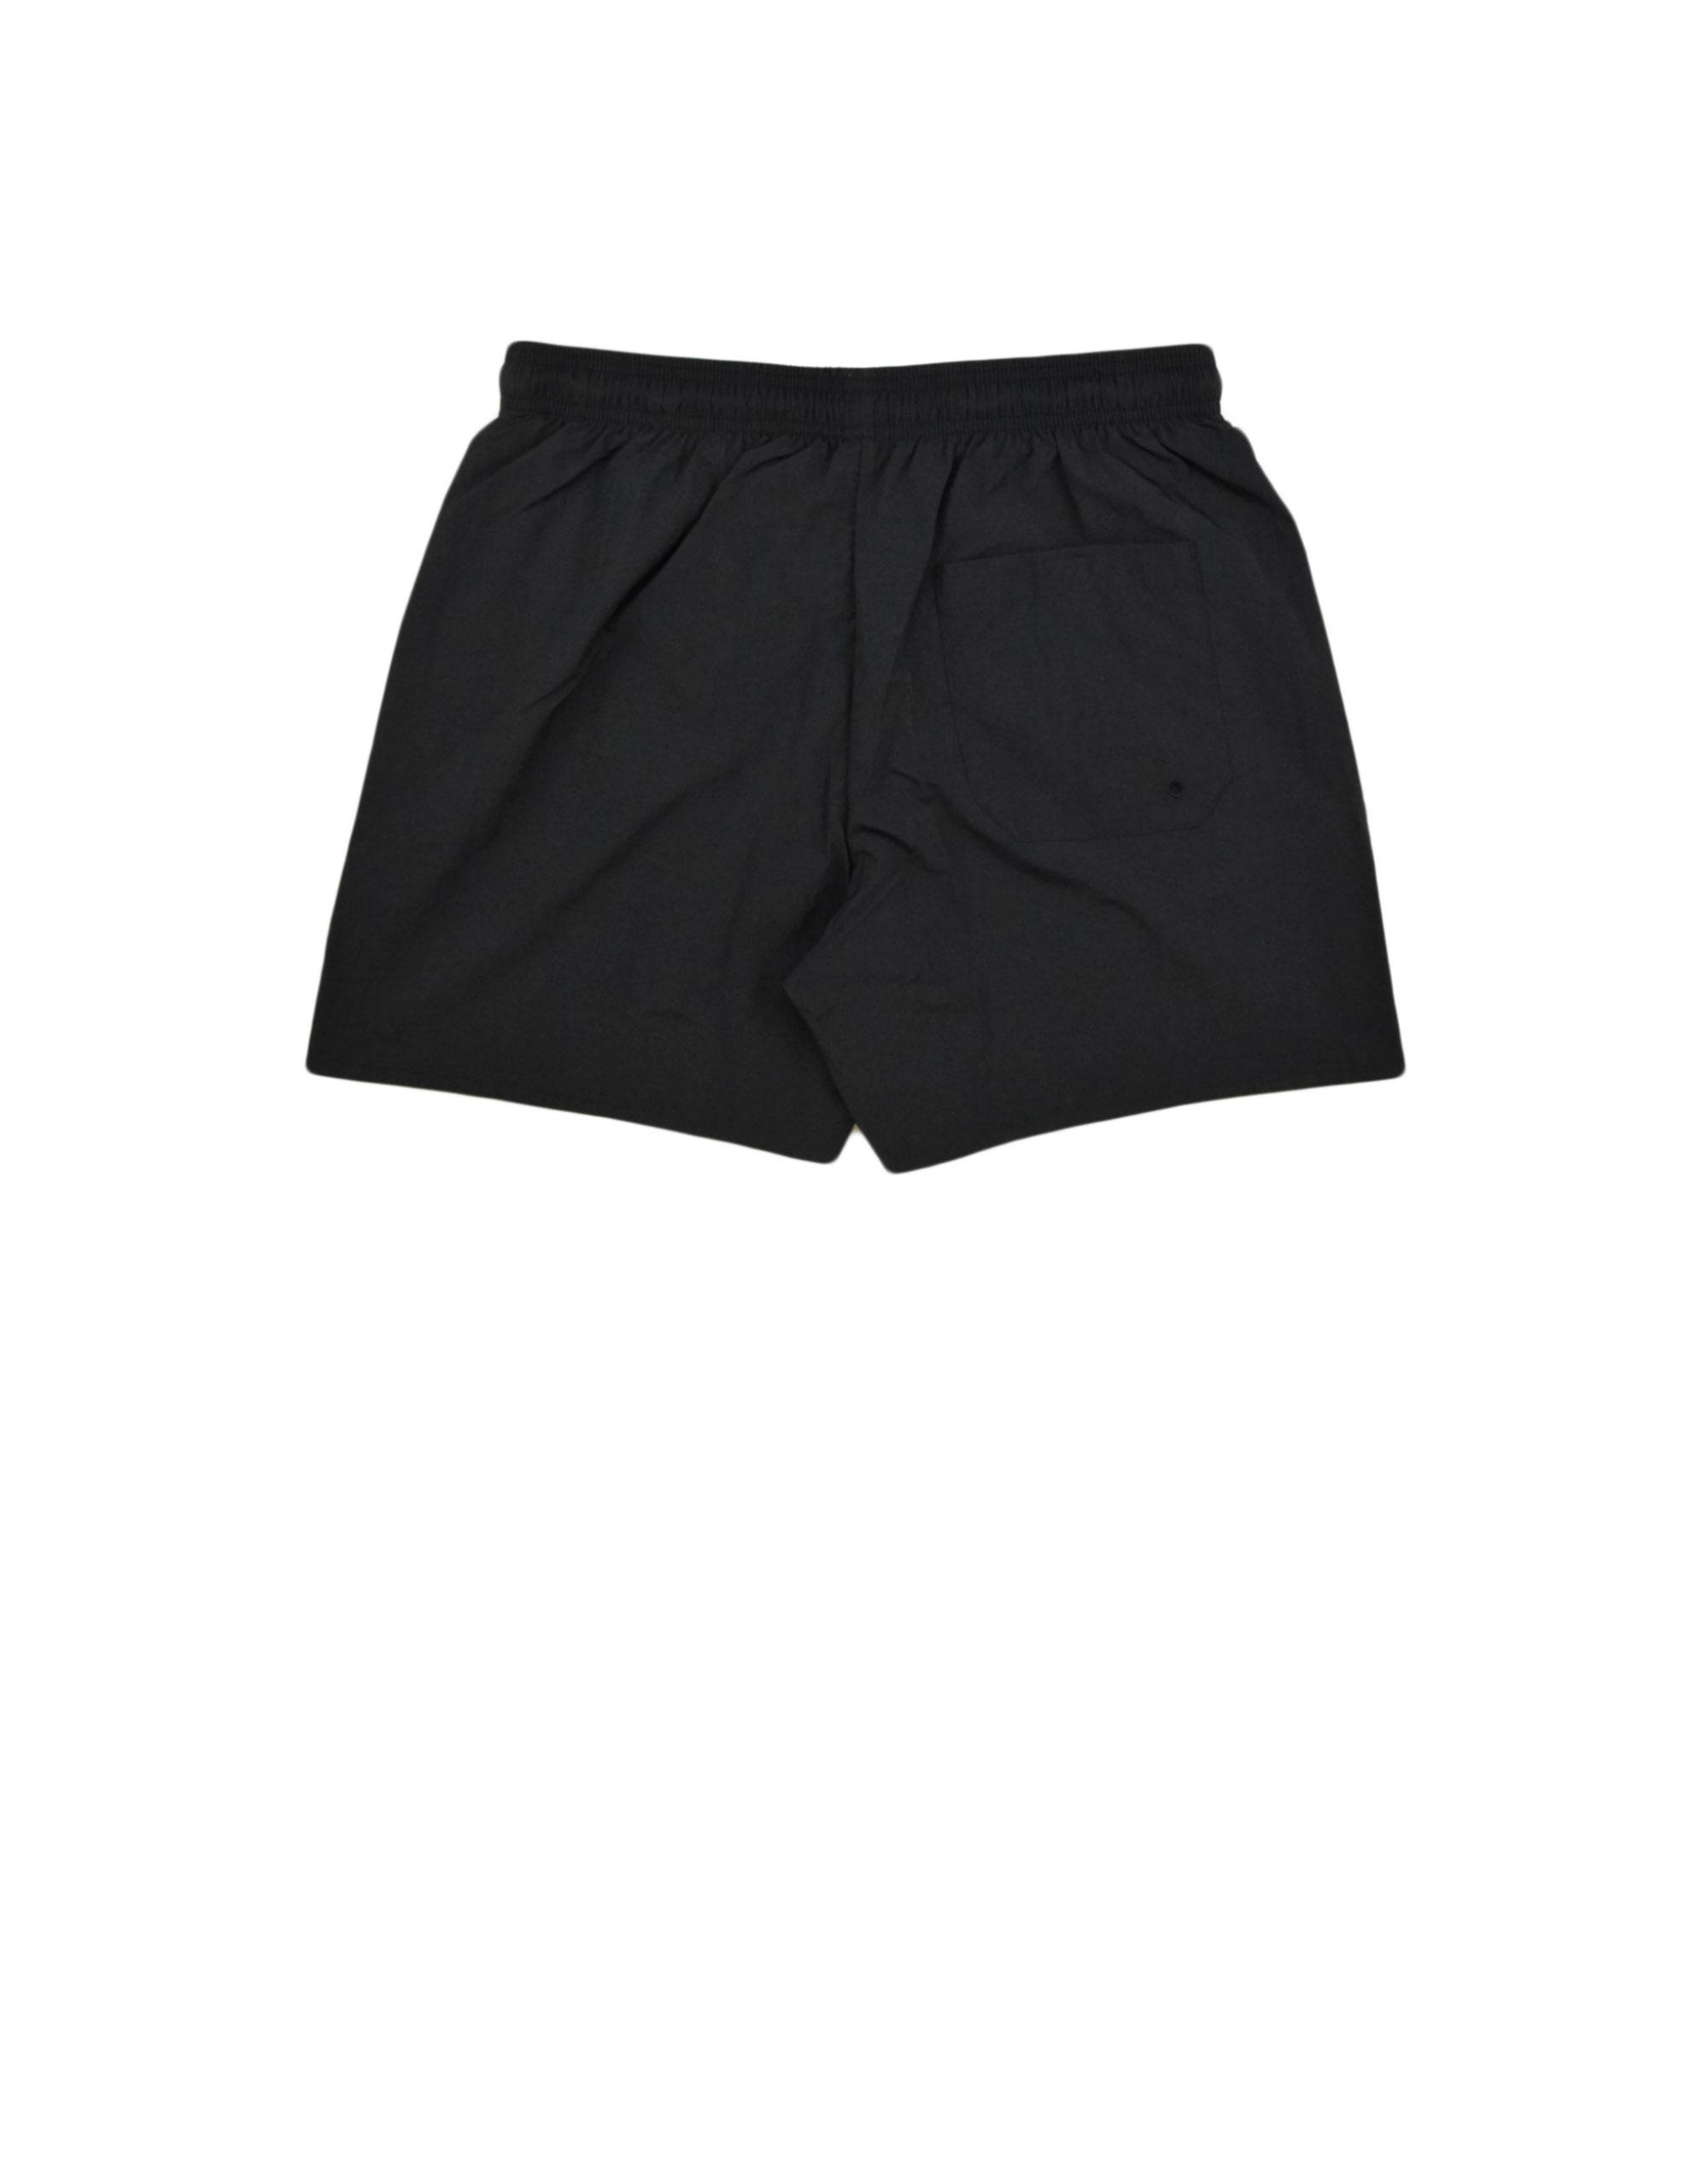 Timberland Sunapee Lk Solid Swimwear (TB0A2CCG 001) Black